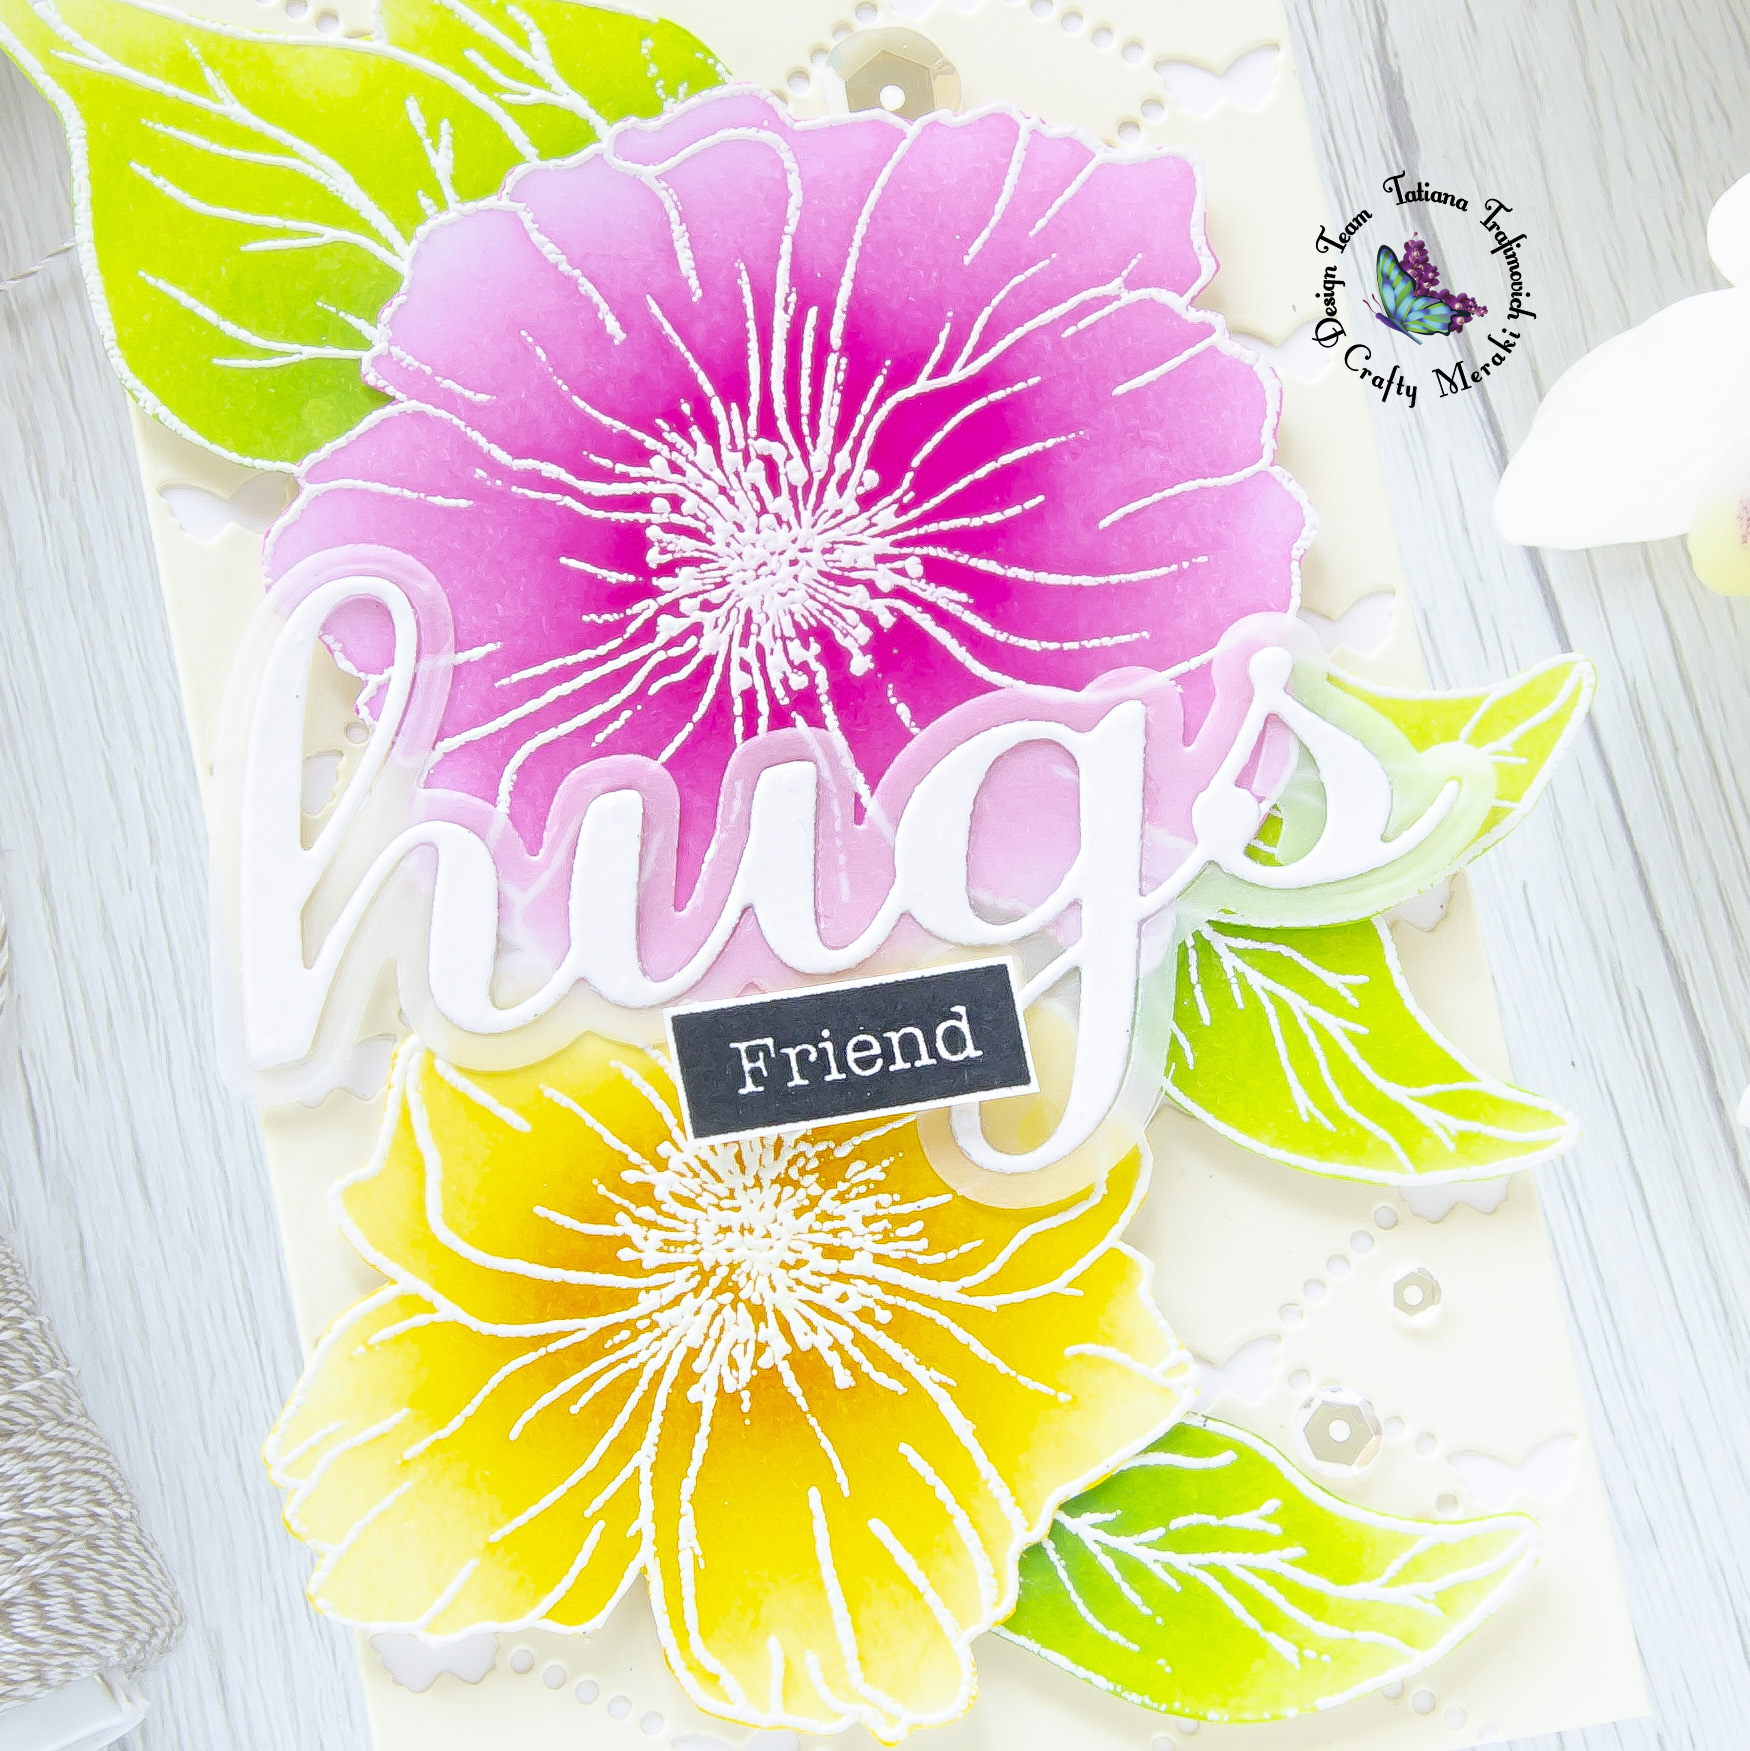 Friend #handmade card by Tatiana Trafimovich #tatianacraftandart - Love Forever stamp set by Crafty Meraki #craftymeraki